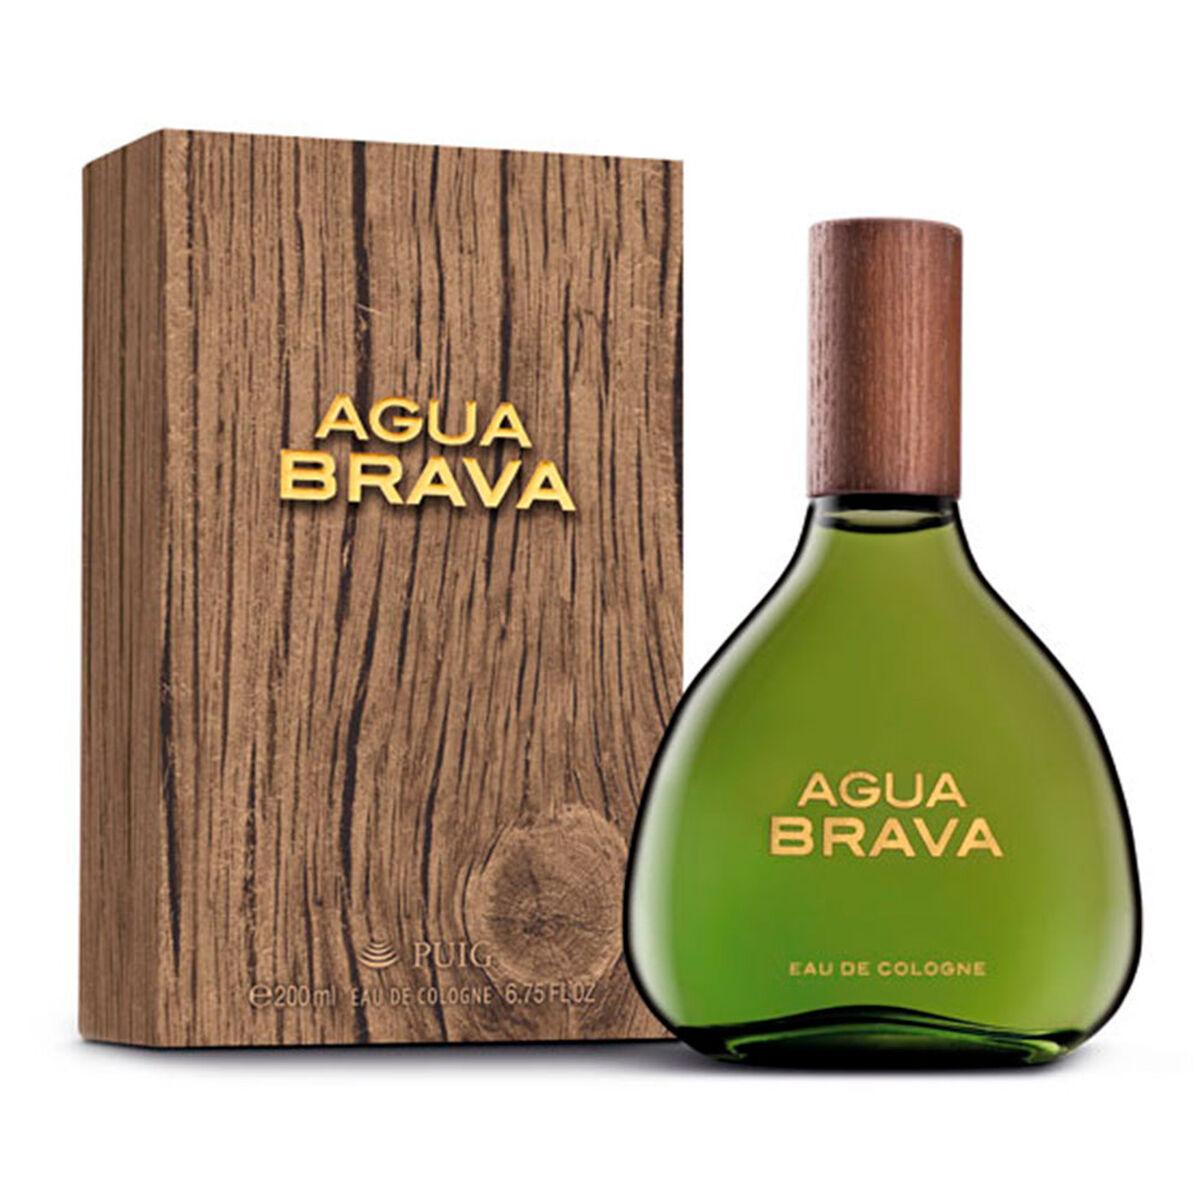 Antonio Piug Agua Brava EDT 200 ml.